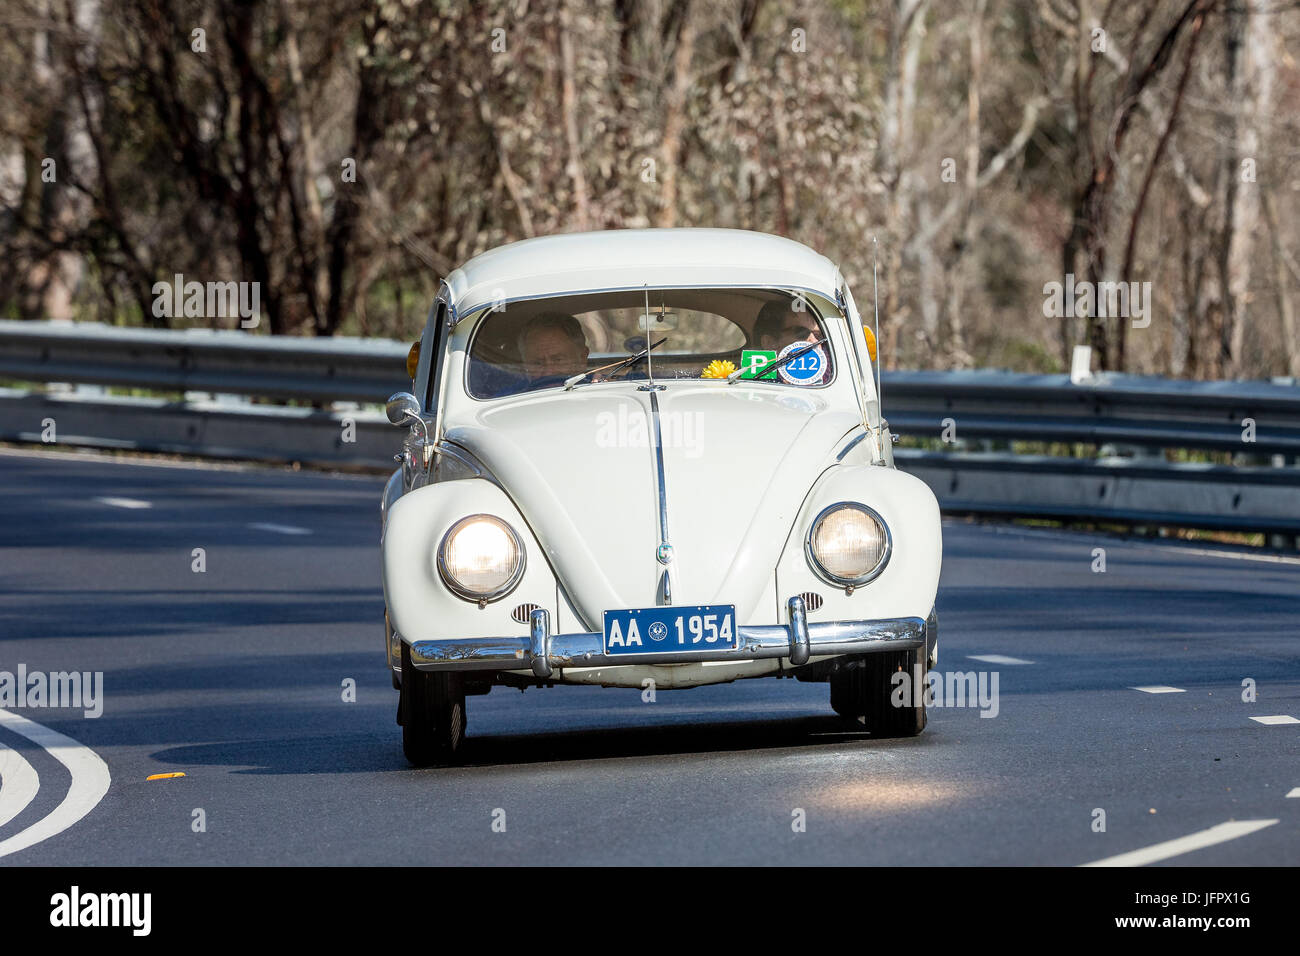 Vintage 1954 Volkswagen Type 1 sedan driving on country roads near the town of Birdwood, South Australia. - Stock Image